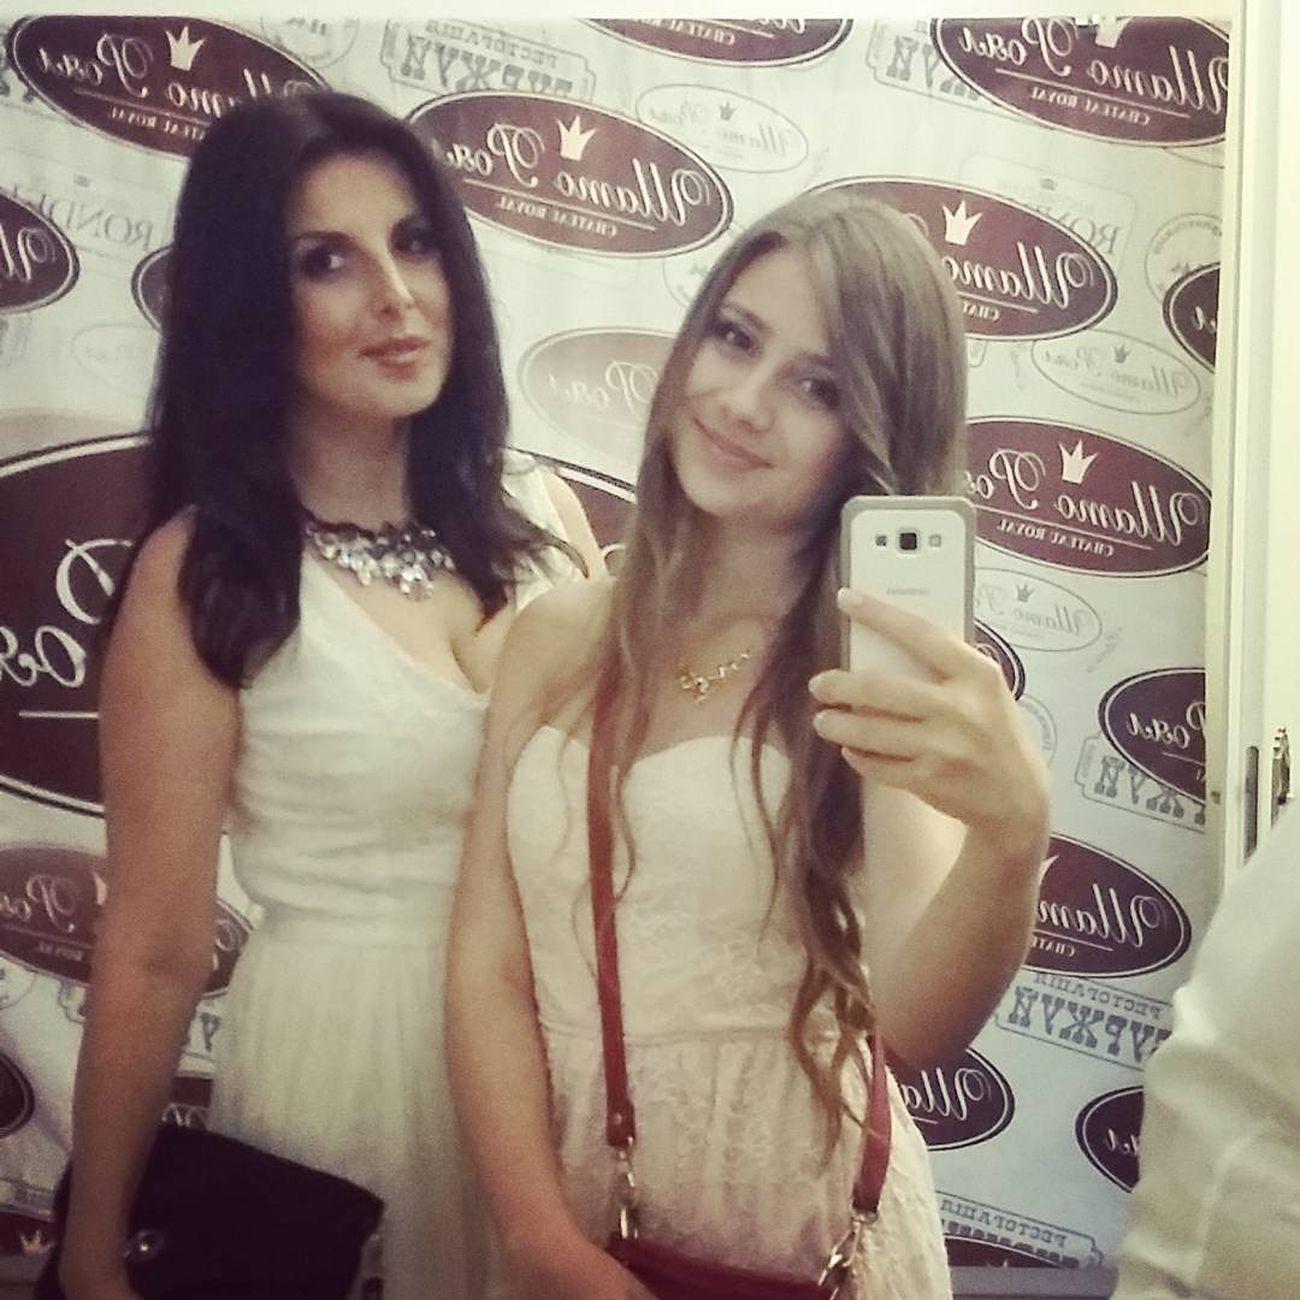 My Best Mom Ukraine 😍😌😊 😉😉summer ☀ 😍😙😙😙😍😍😙😻😻😻 Hi! My Selfe